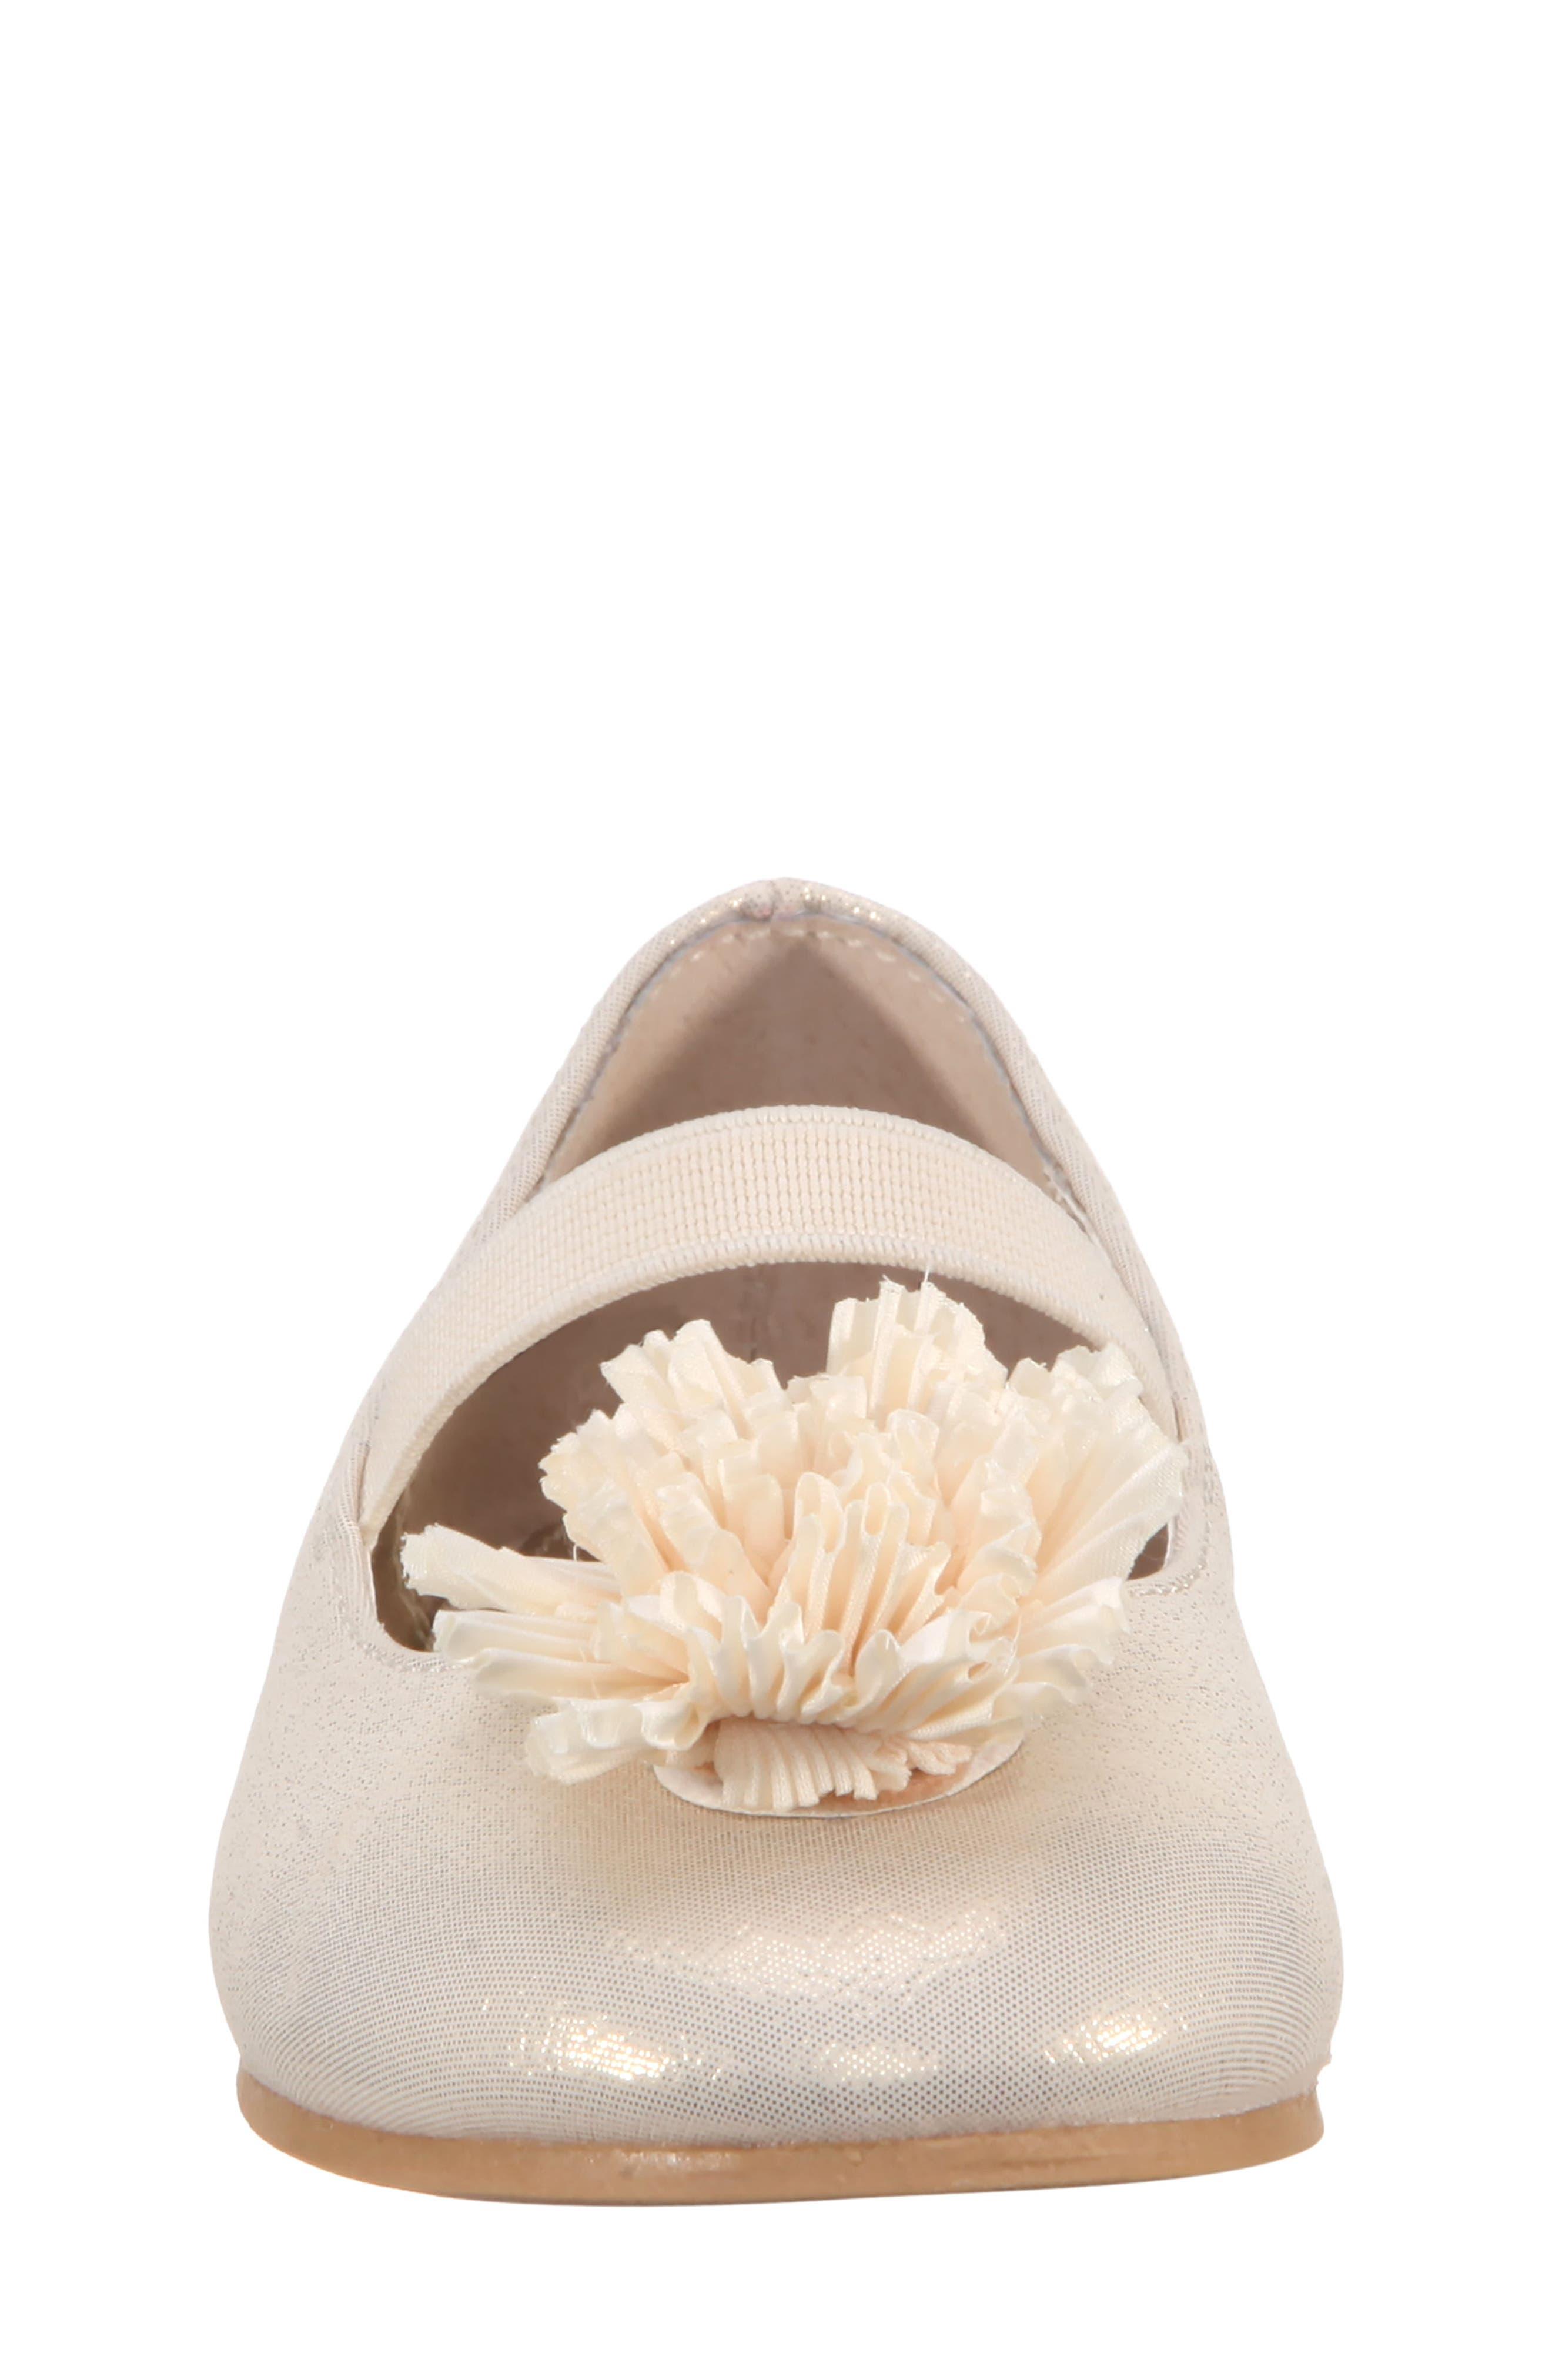 Jemma-T Bow Ballet Flat,                             Alternate thumbnail 4, color,                             Platino Metallic